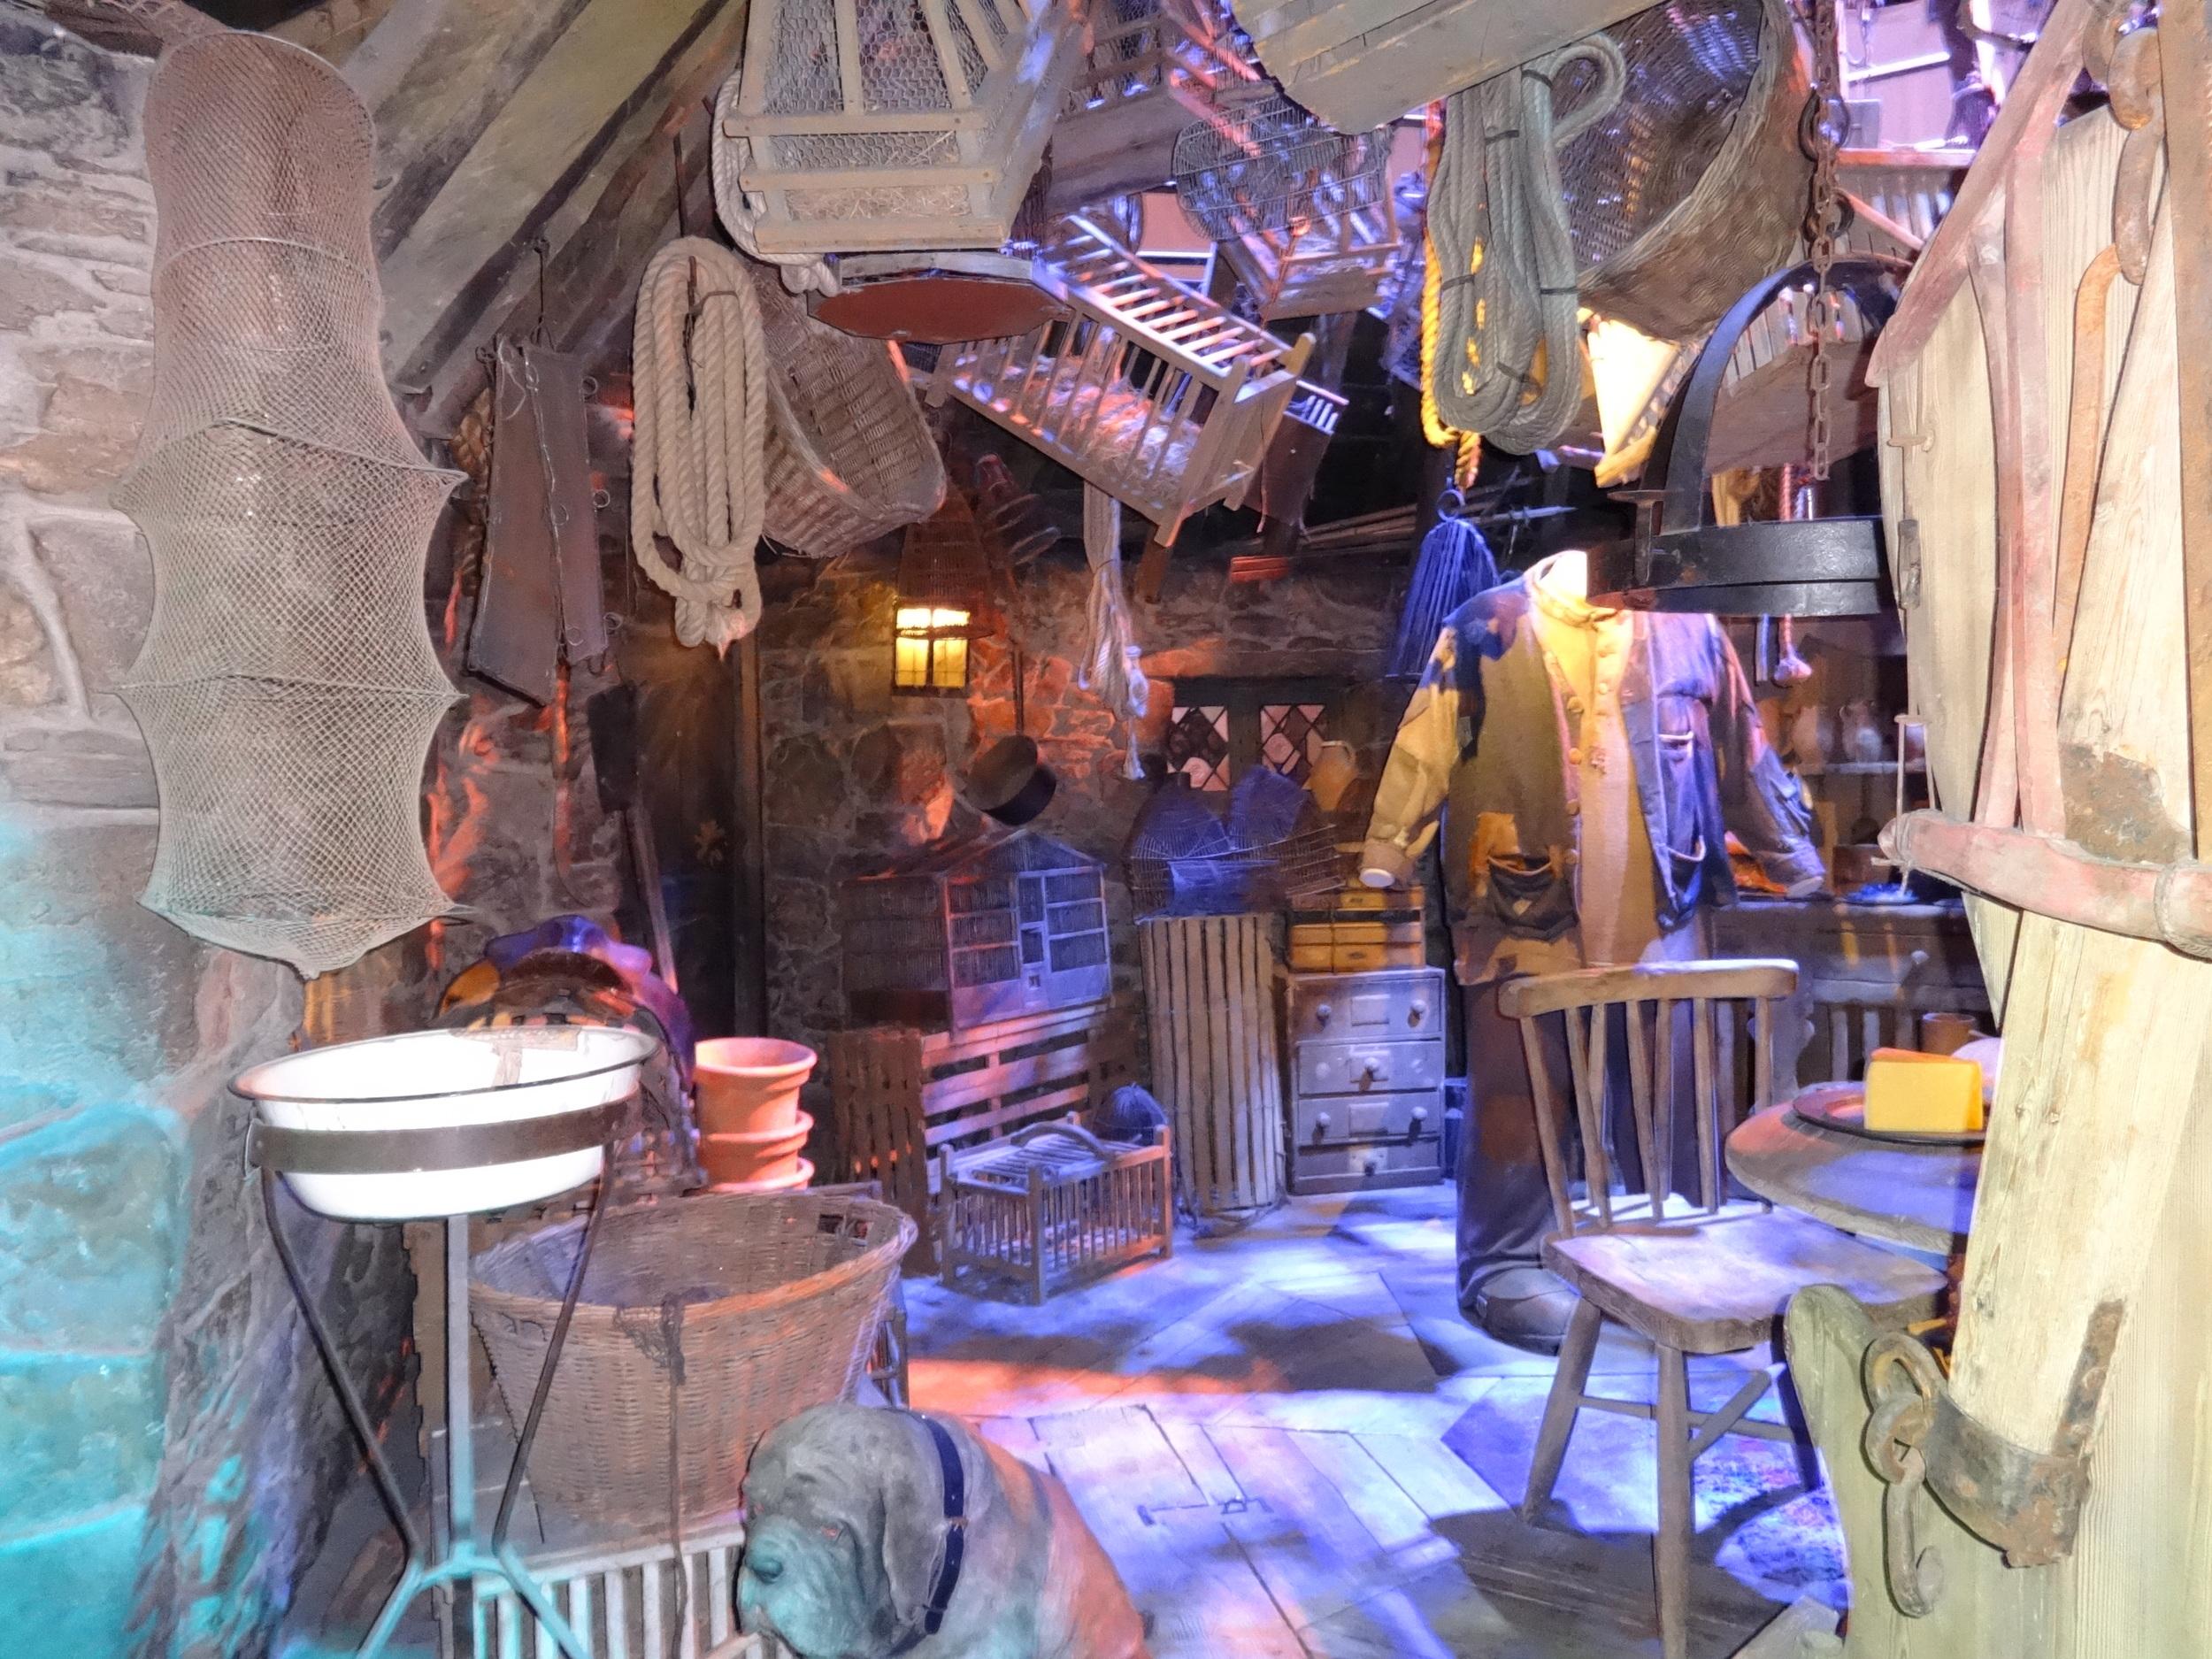 Inside of Hagrid's home